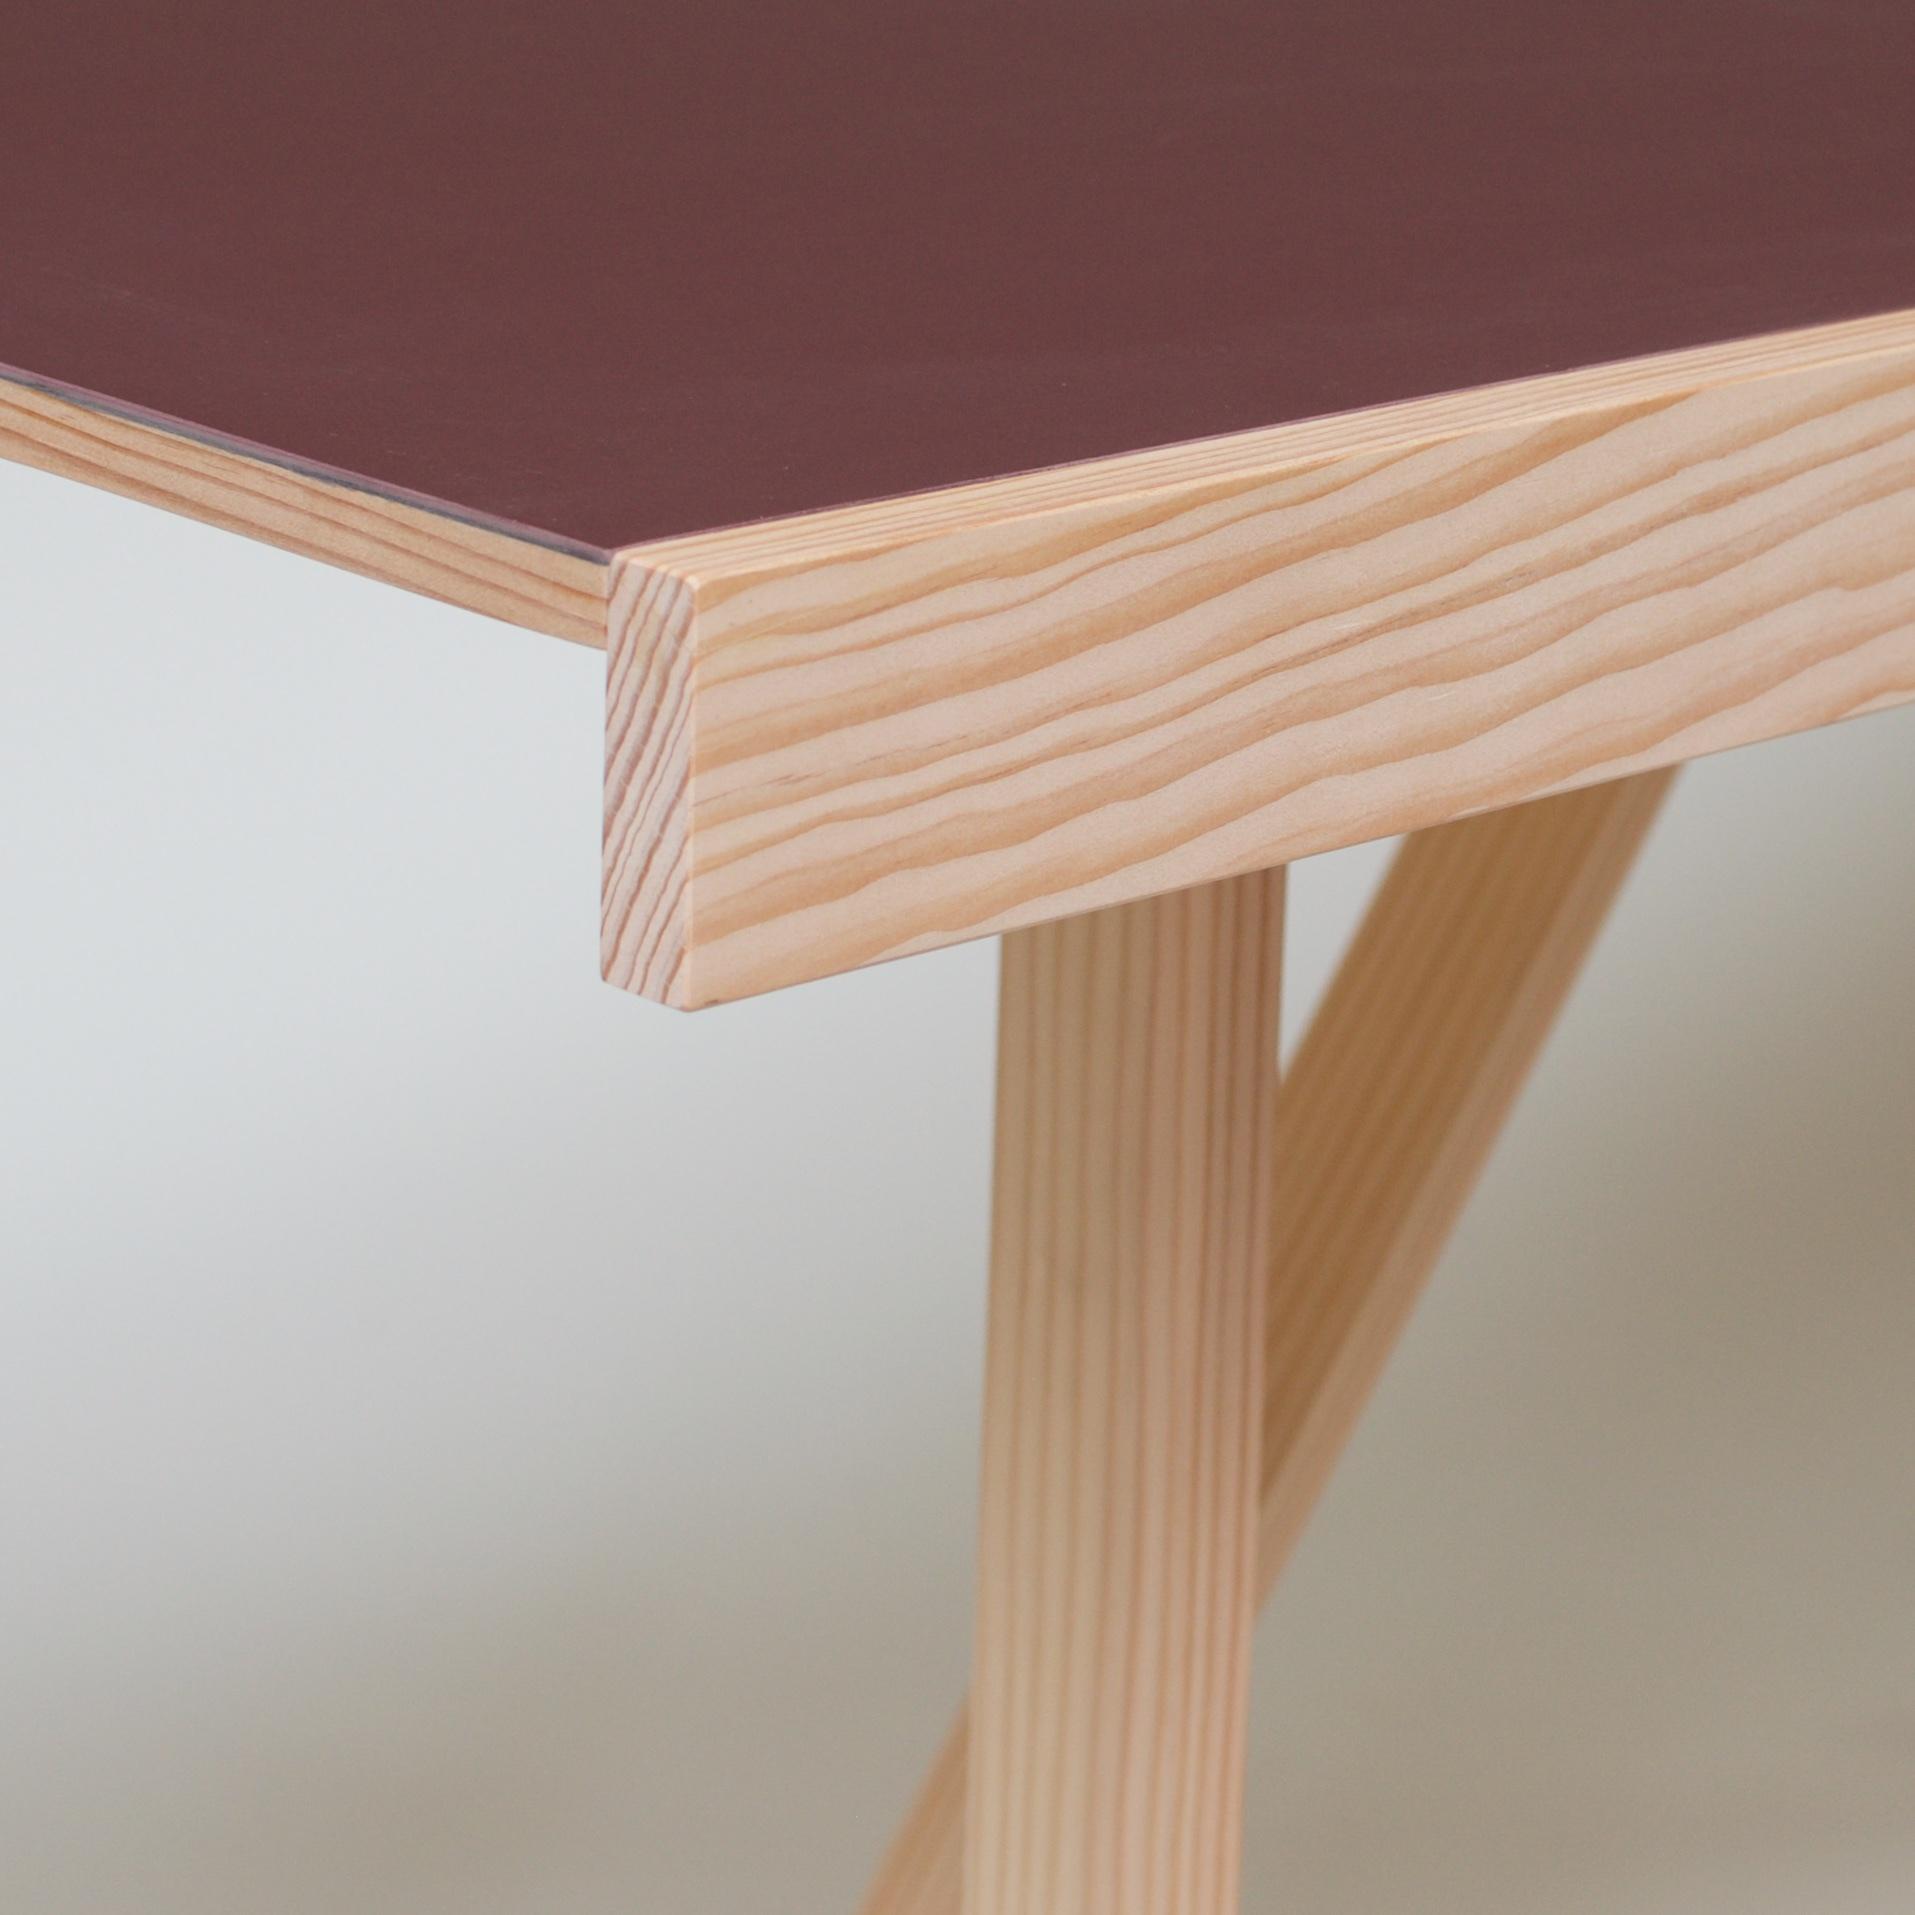 Lino Folding Table detail.jpg